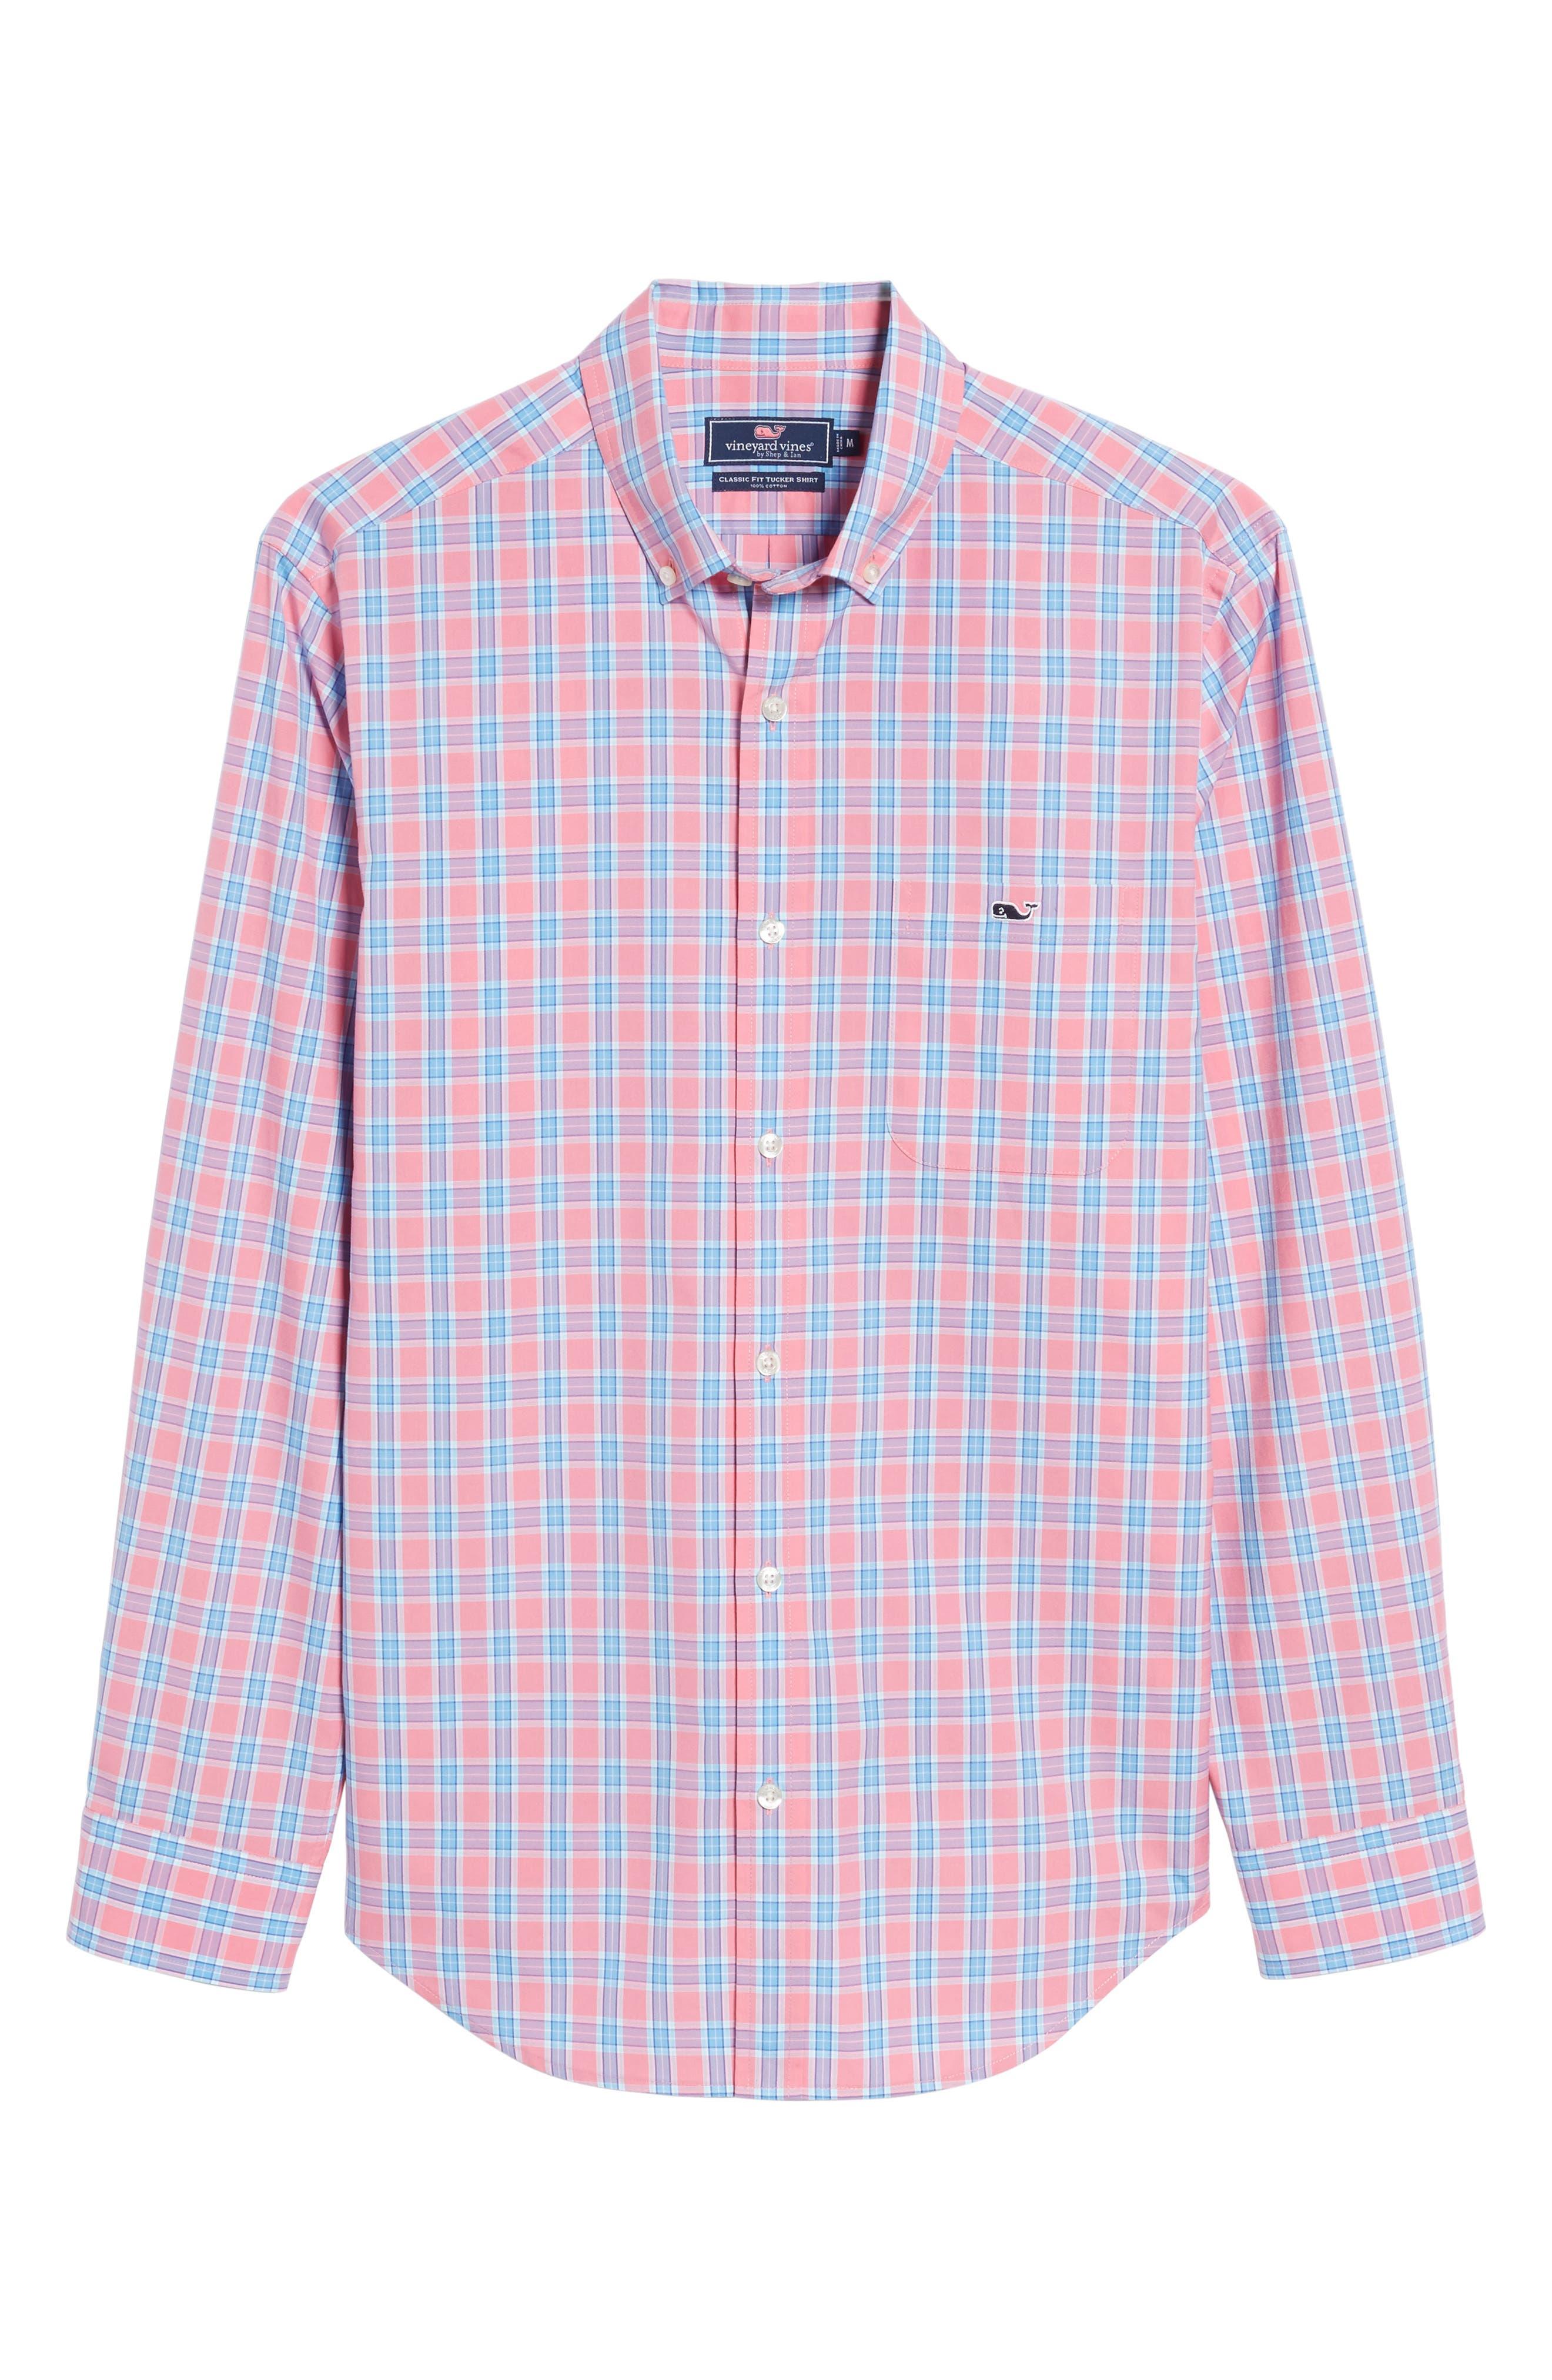 Tucker Bayard Classic Fit Plaid Sport Shirt,                             Alternate thumbnail 6, color,                             650